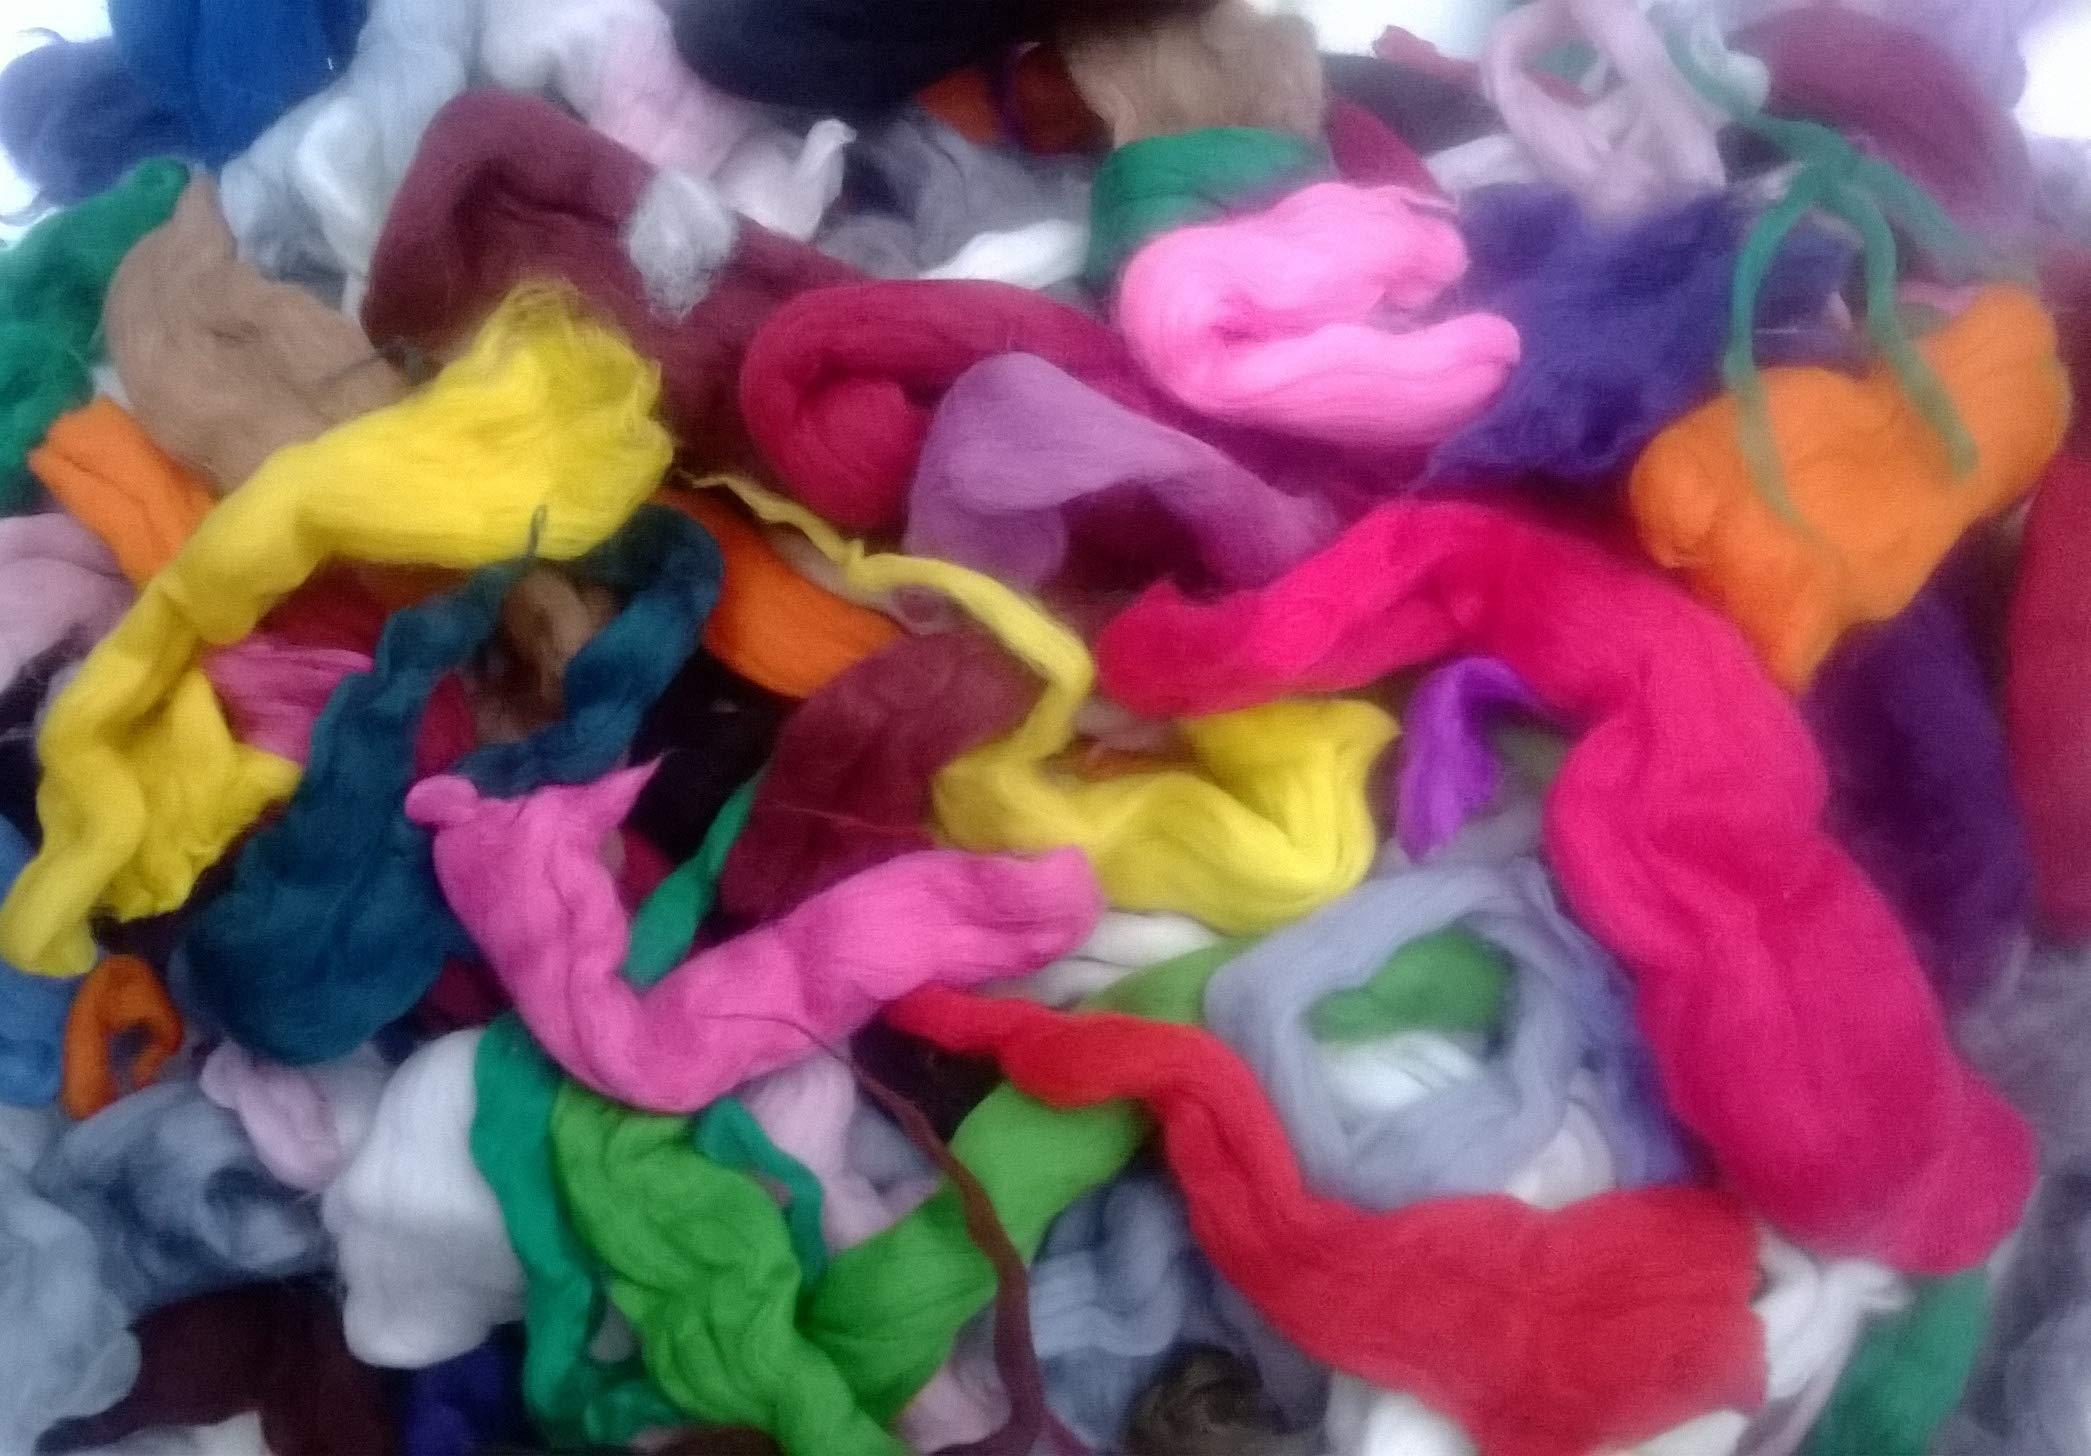 Heidifeathers Big Bag of Wool of Cuts/Wool Scraps - Merino, Natural (10.5oz) (Mixed, 10.5oz (Large))